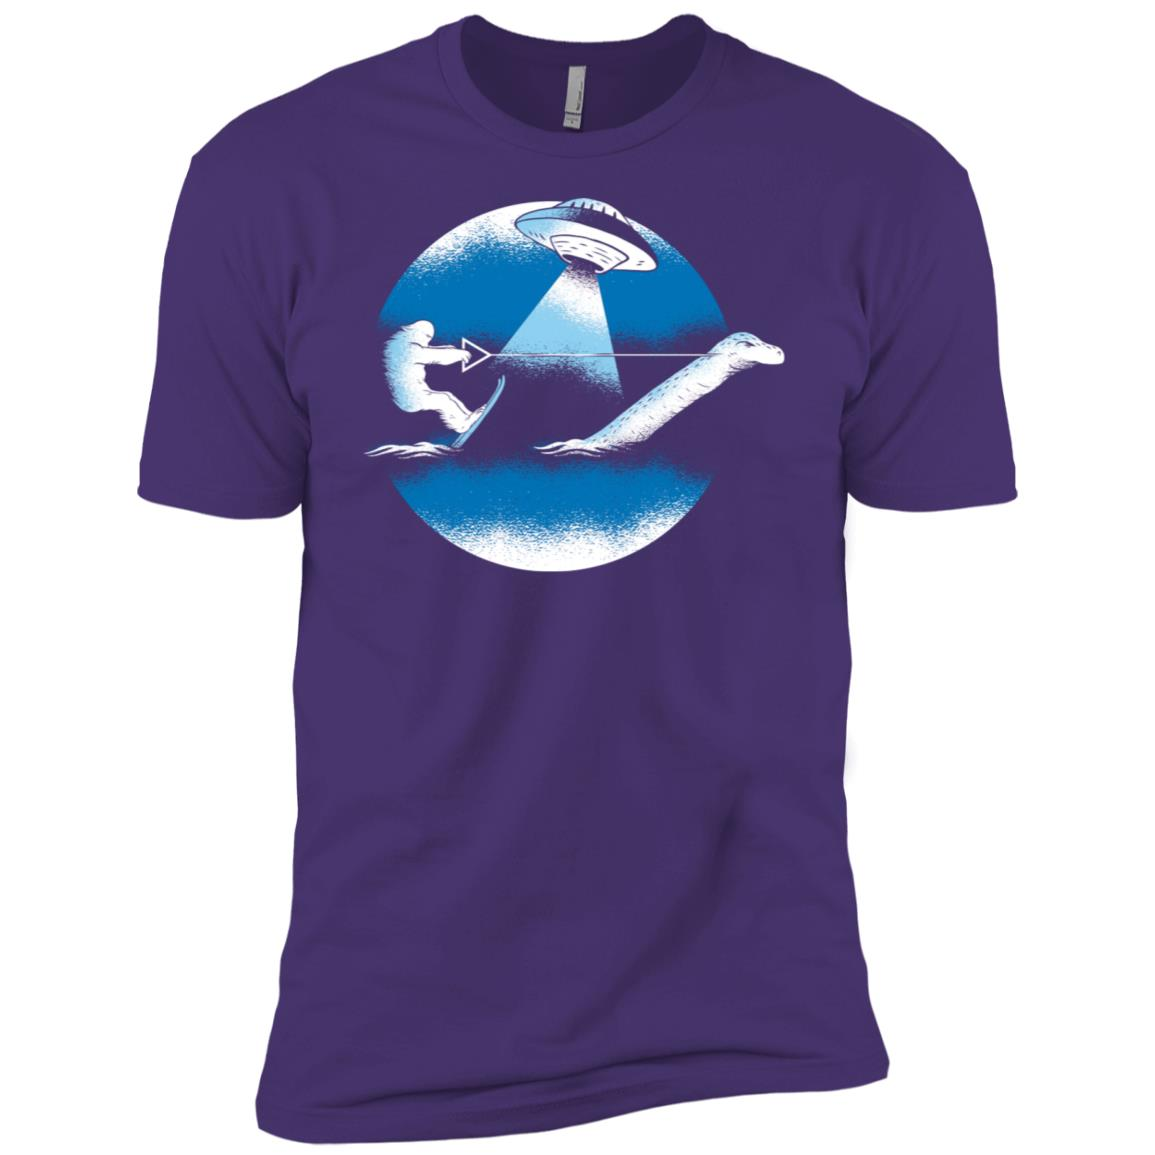 Bigfoot Water Ski With Loch Ness Monster & Ufo Funny Men Short Sleeve T-Shirt